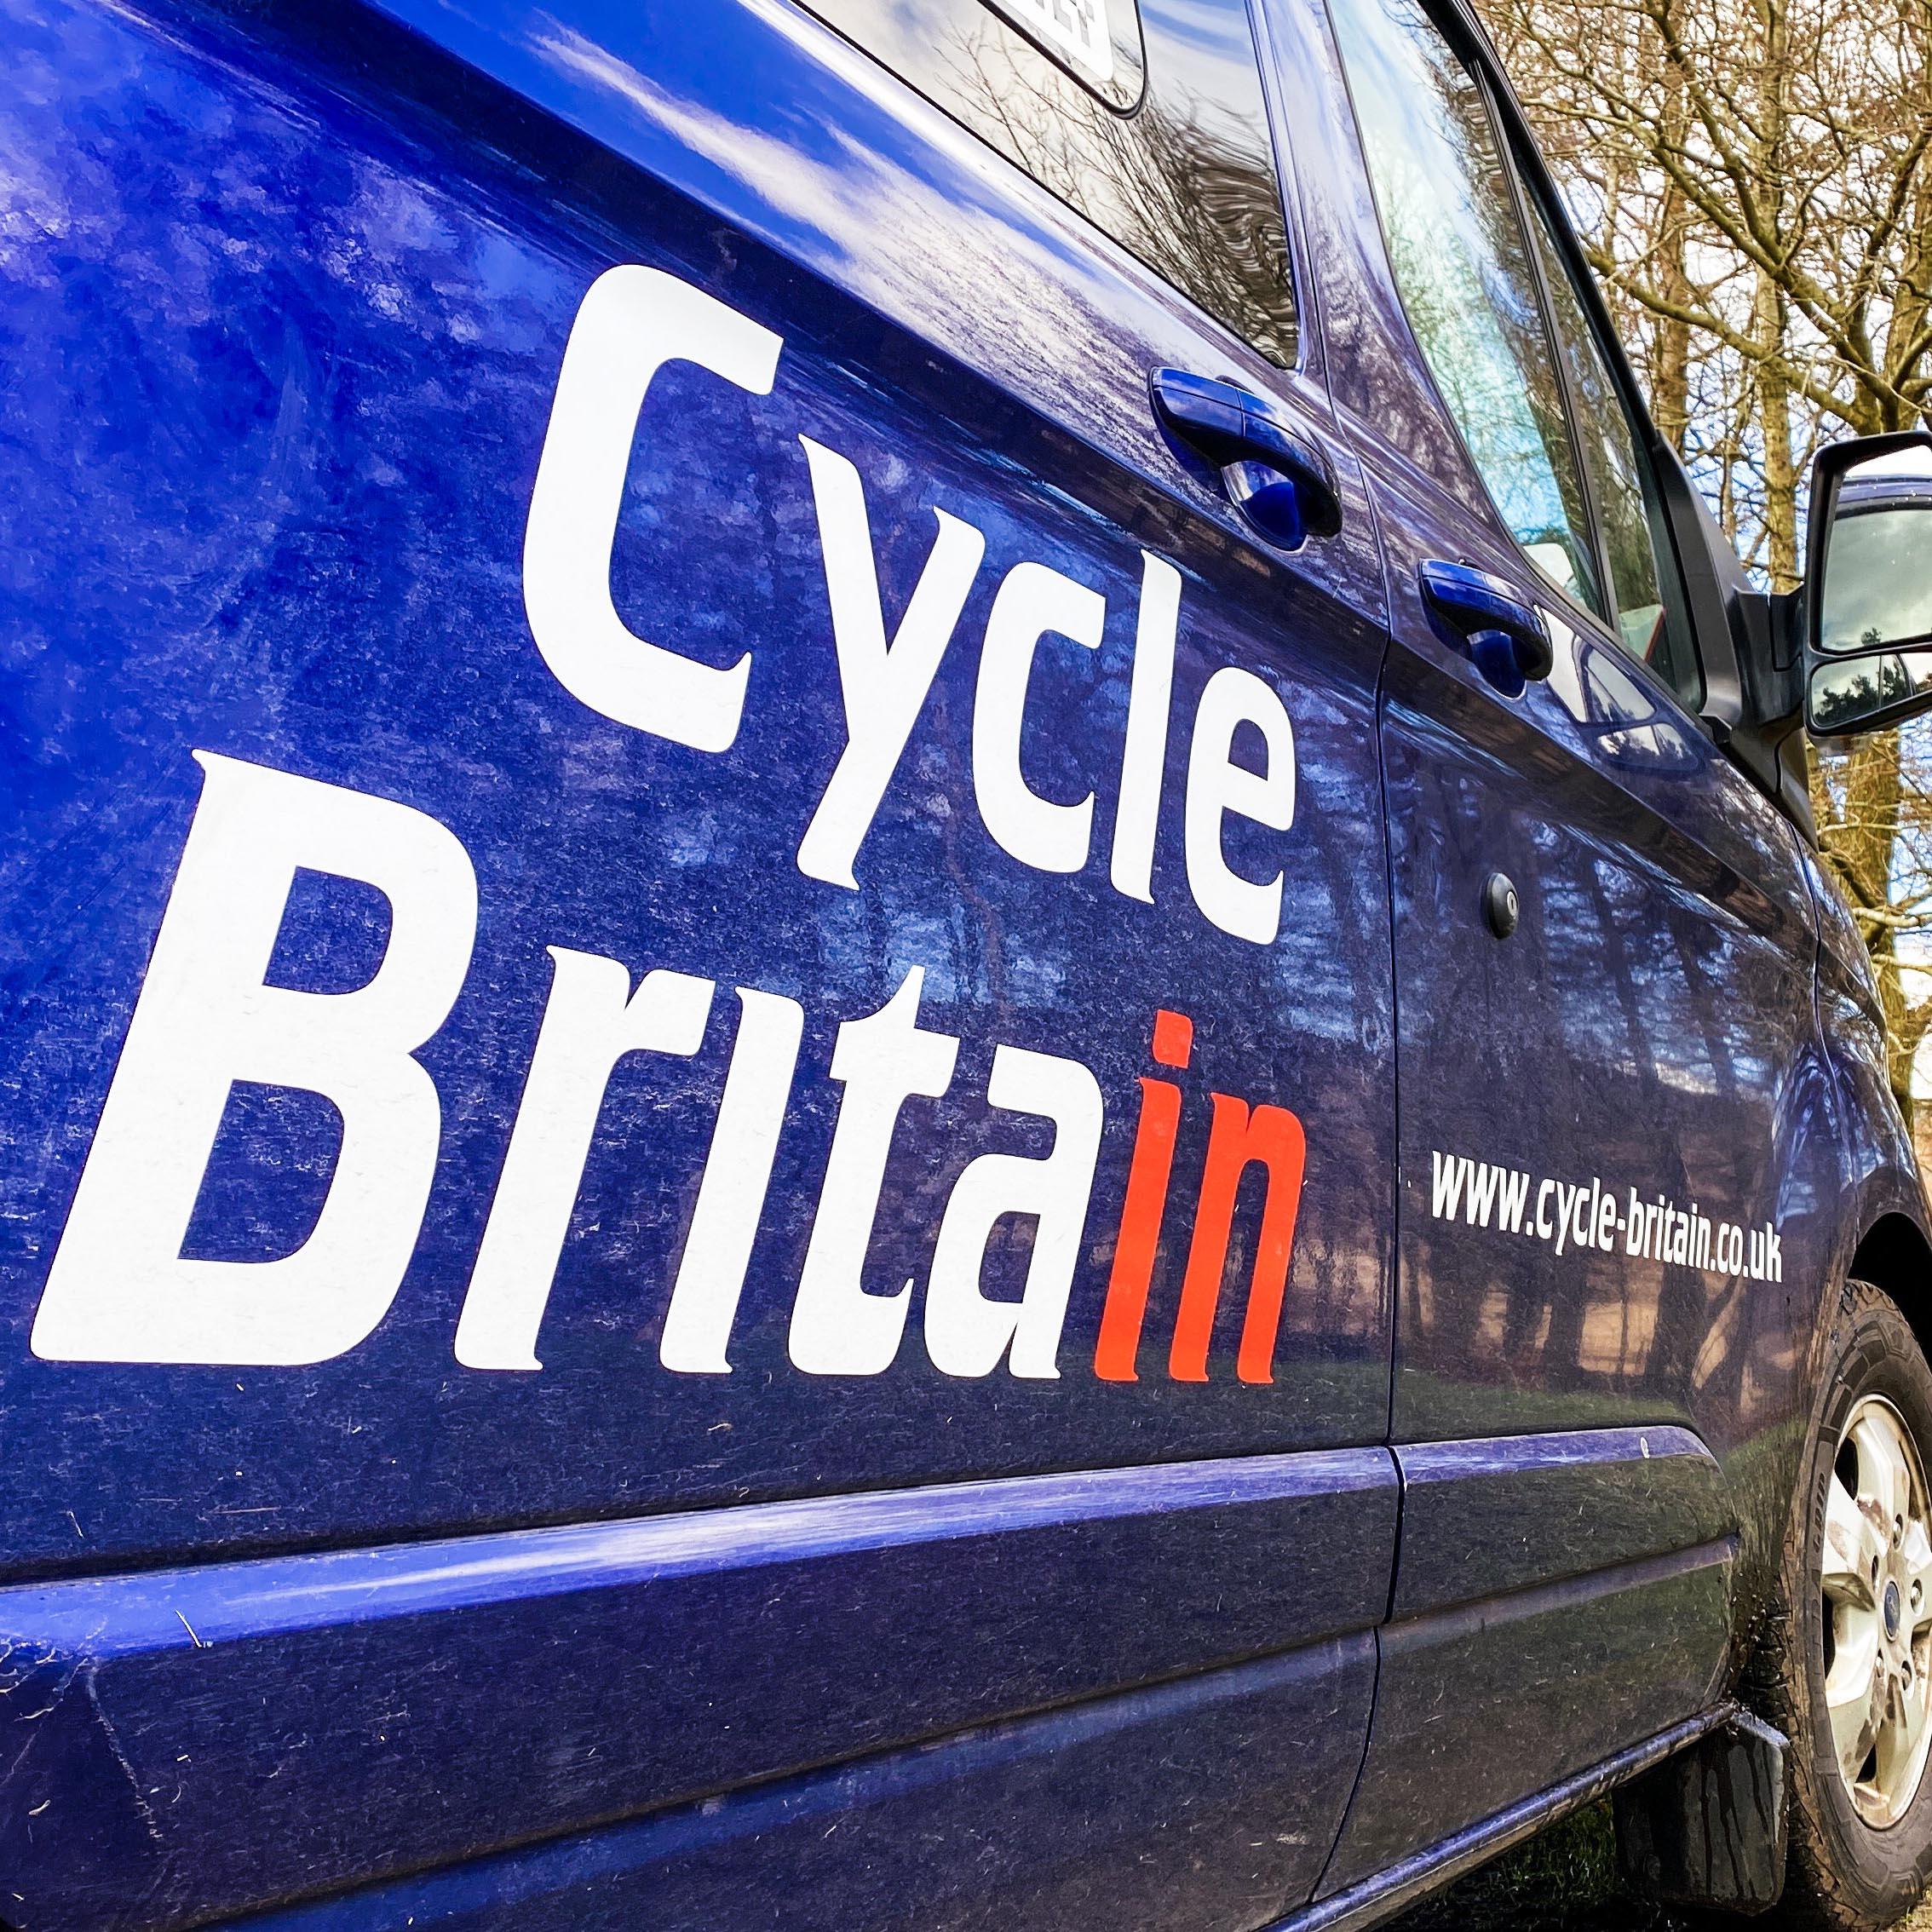 Cycle Britain